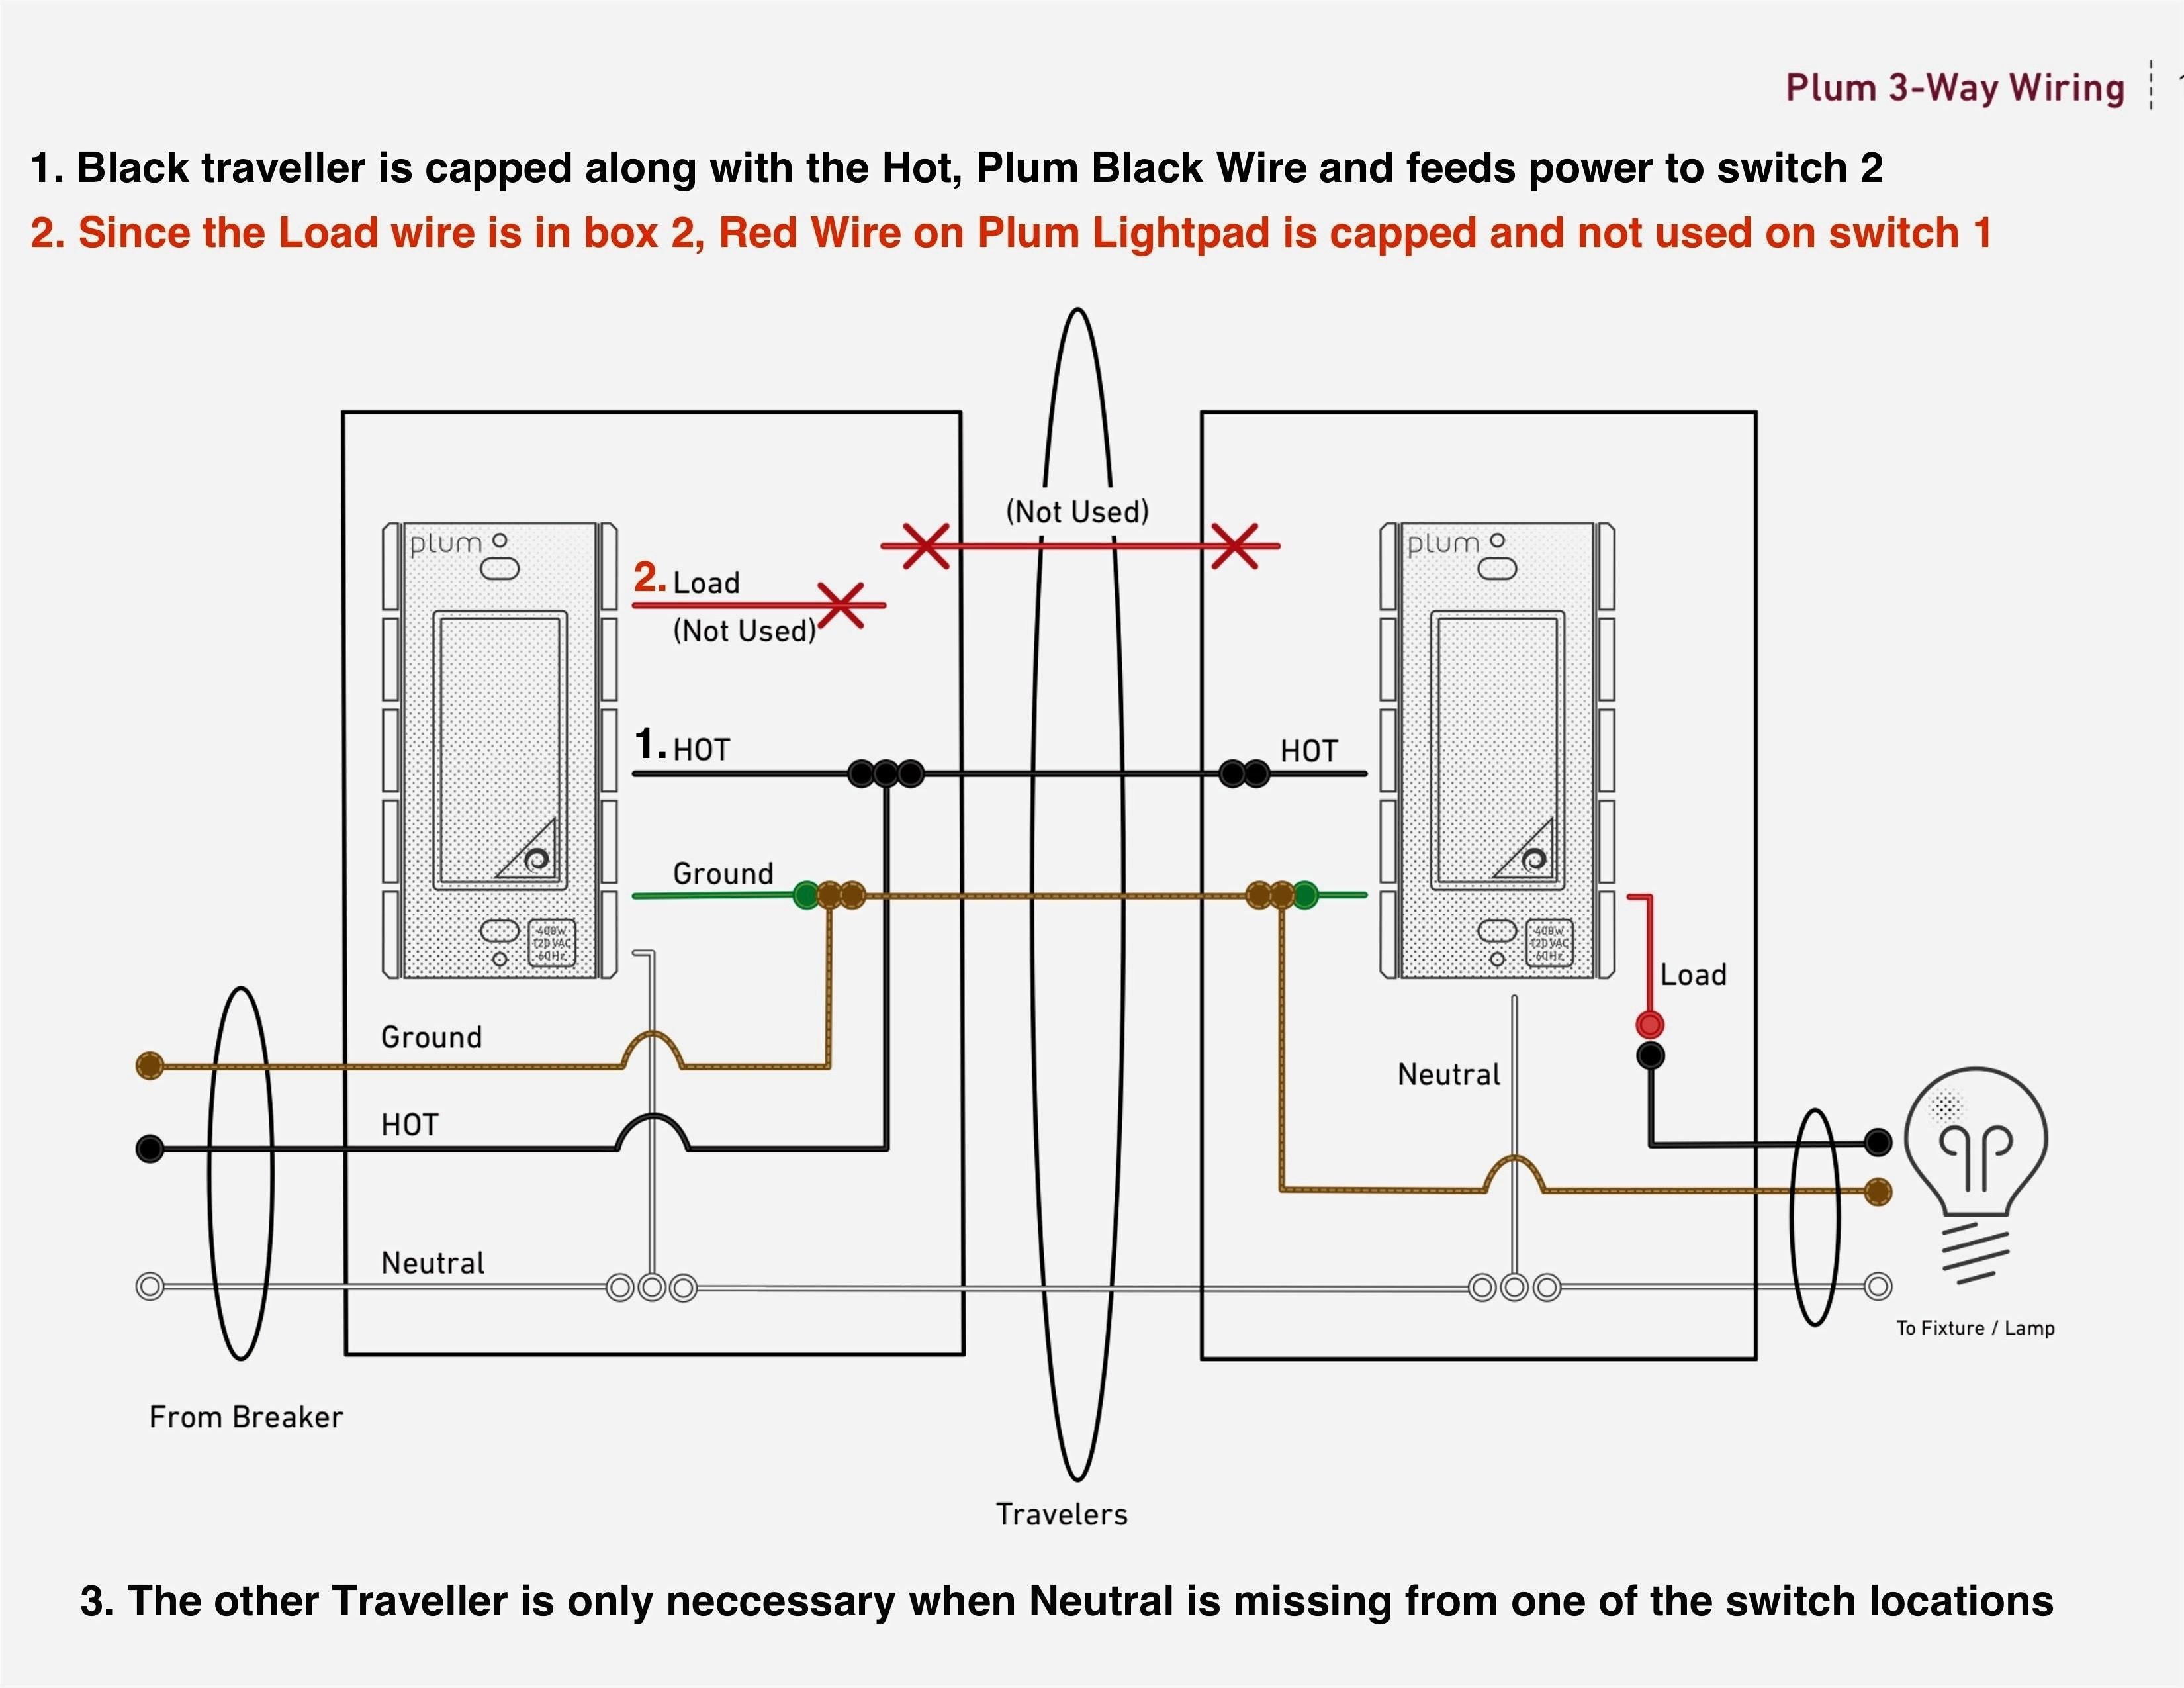 3 Way Lutron Skylark Dimmer Wiring Diagram | Manual E-Books - Lutron 3 Way Dimmer Switch Wiring Diagram